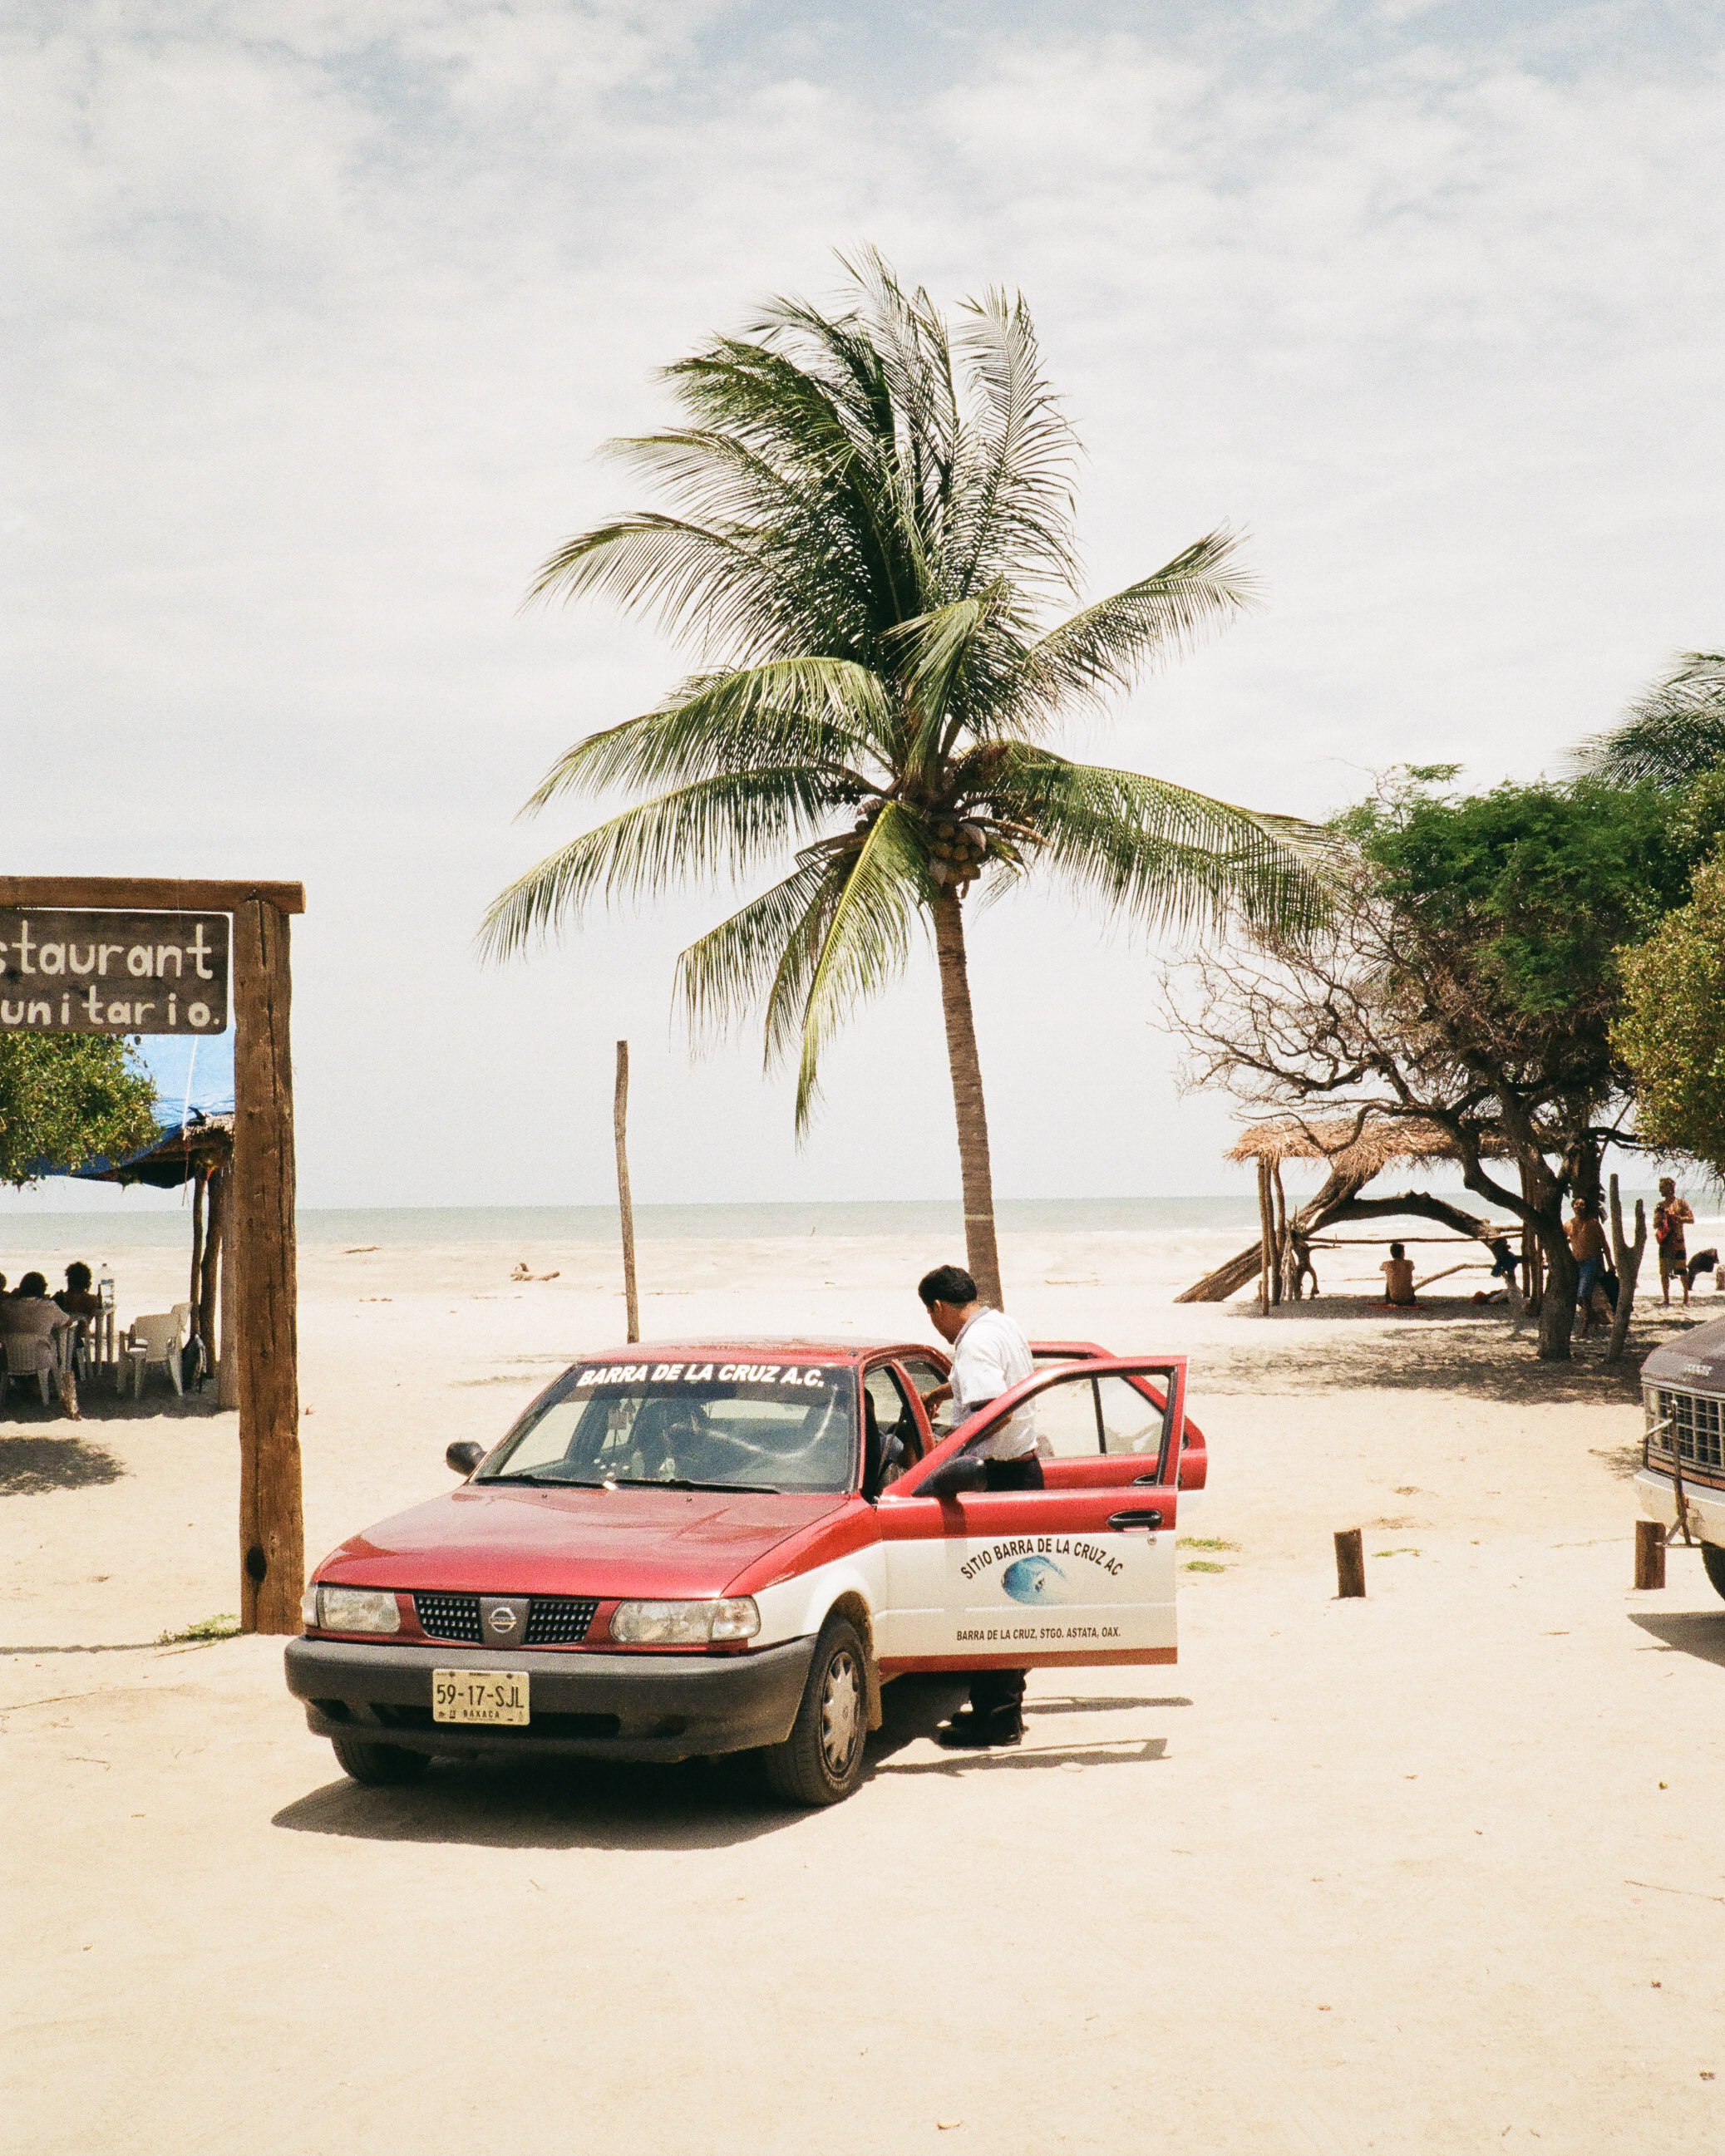 captainbarto-blog-adambartoshesky-model-nautica-client-mexico-surf-trip-mexican-mirage-september-2018-1961.jpg